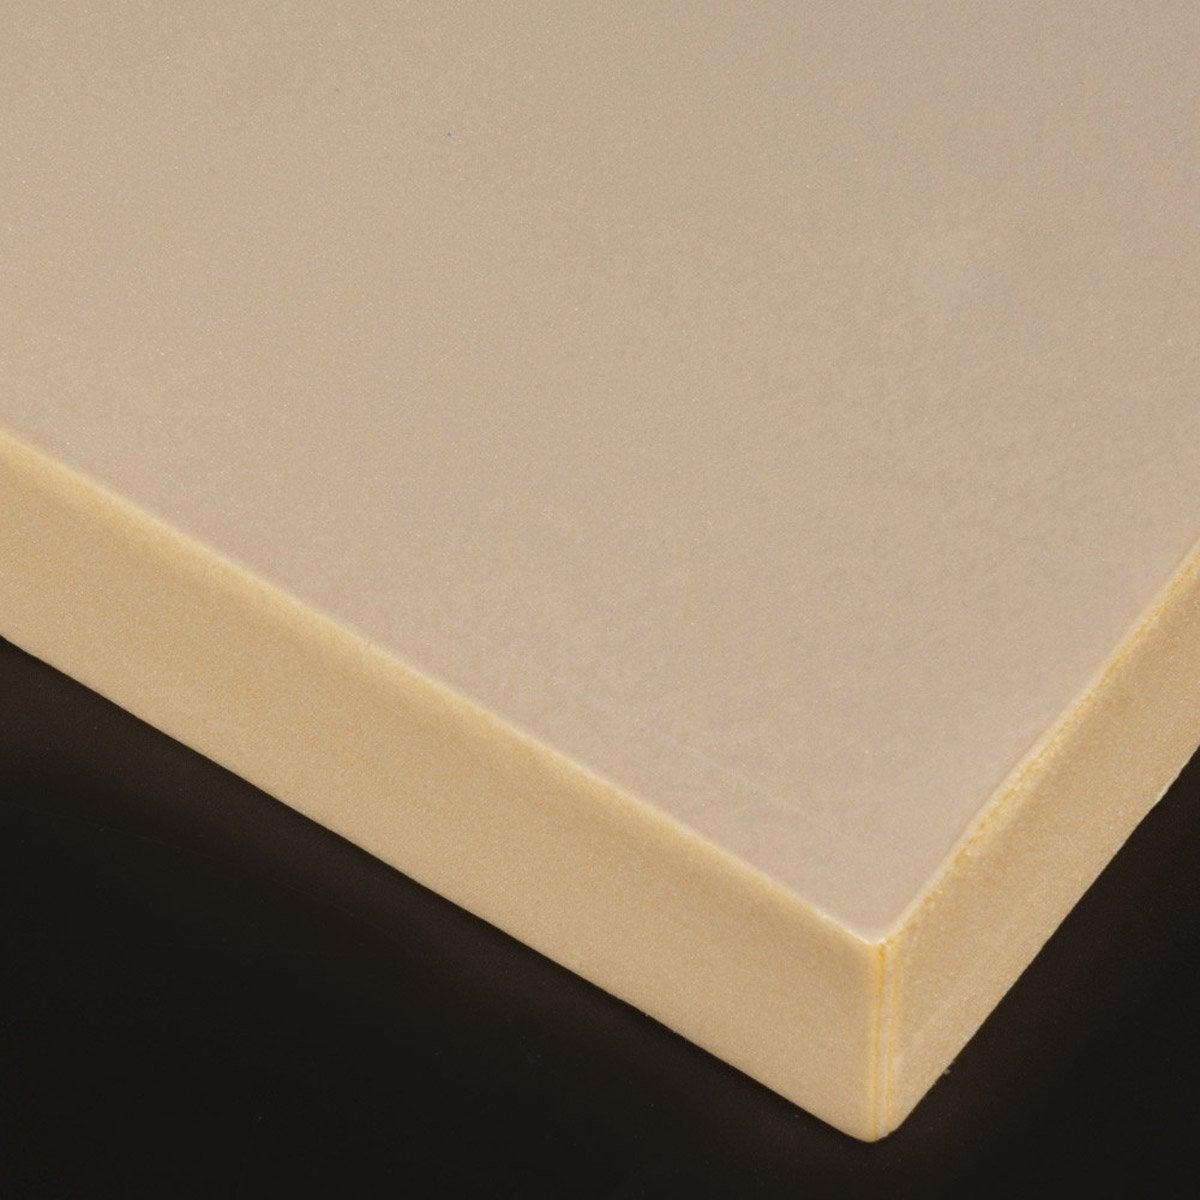 plaque polystyrène 30 mm marron mat l100 x 50 cm  leroy